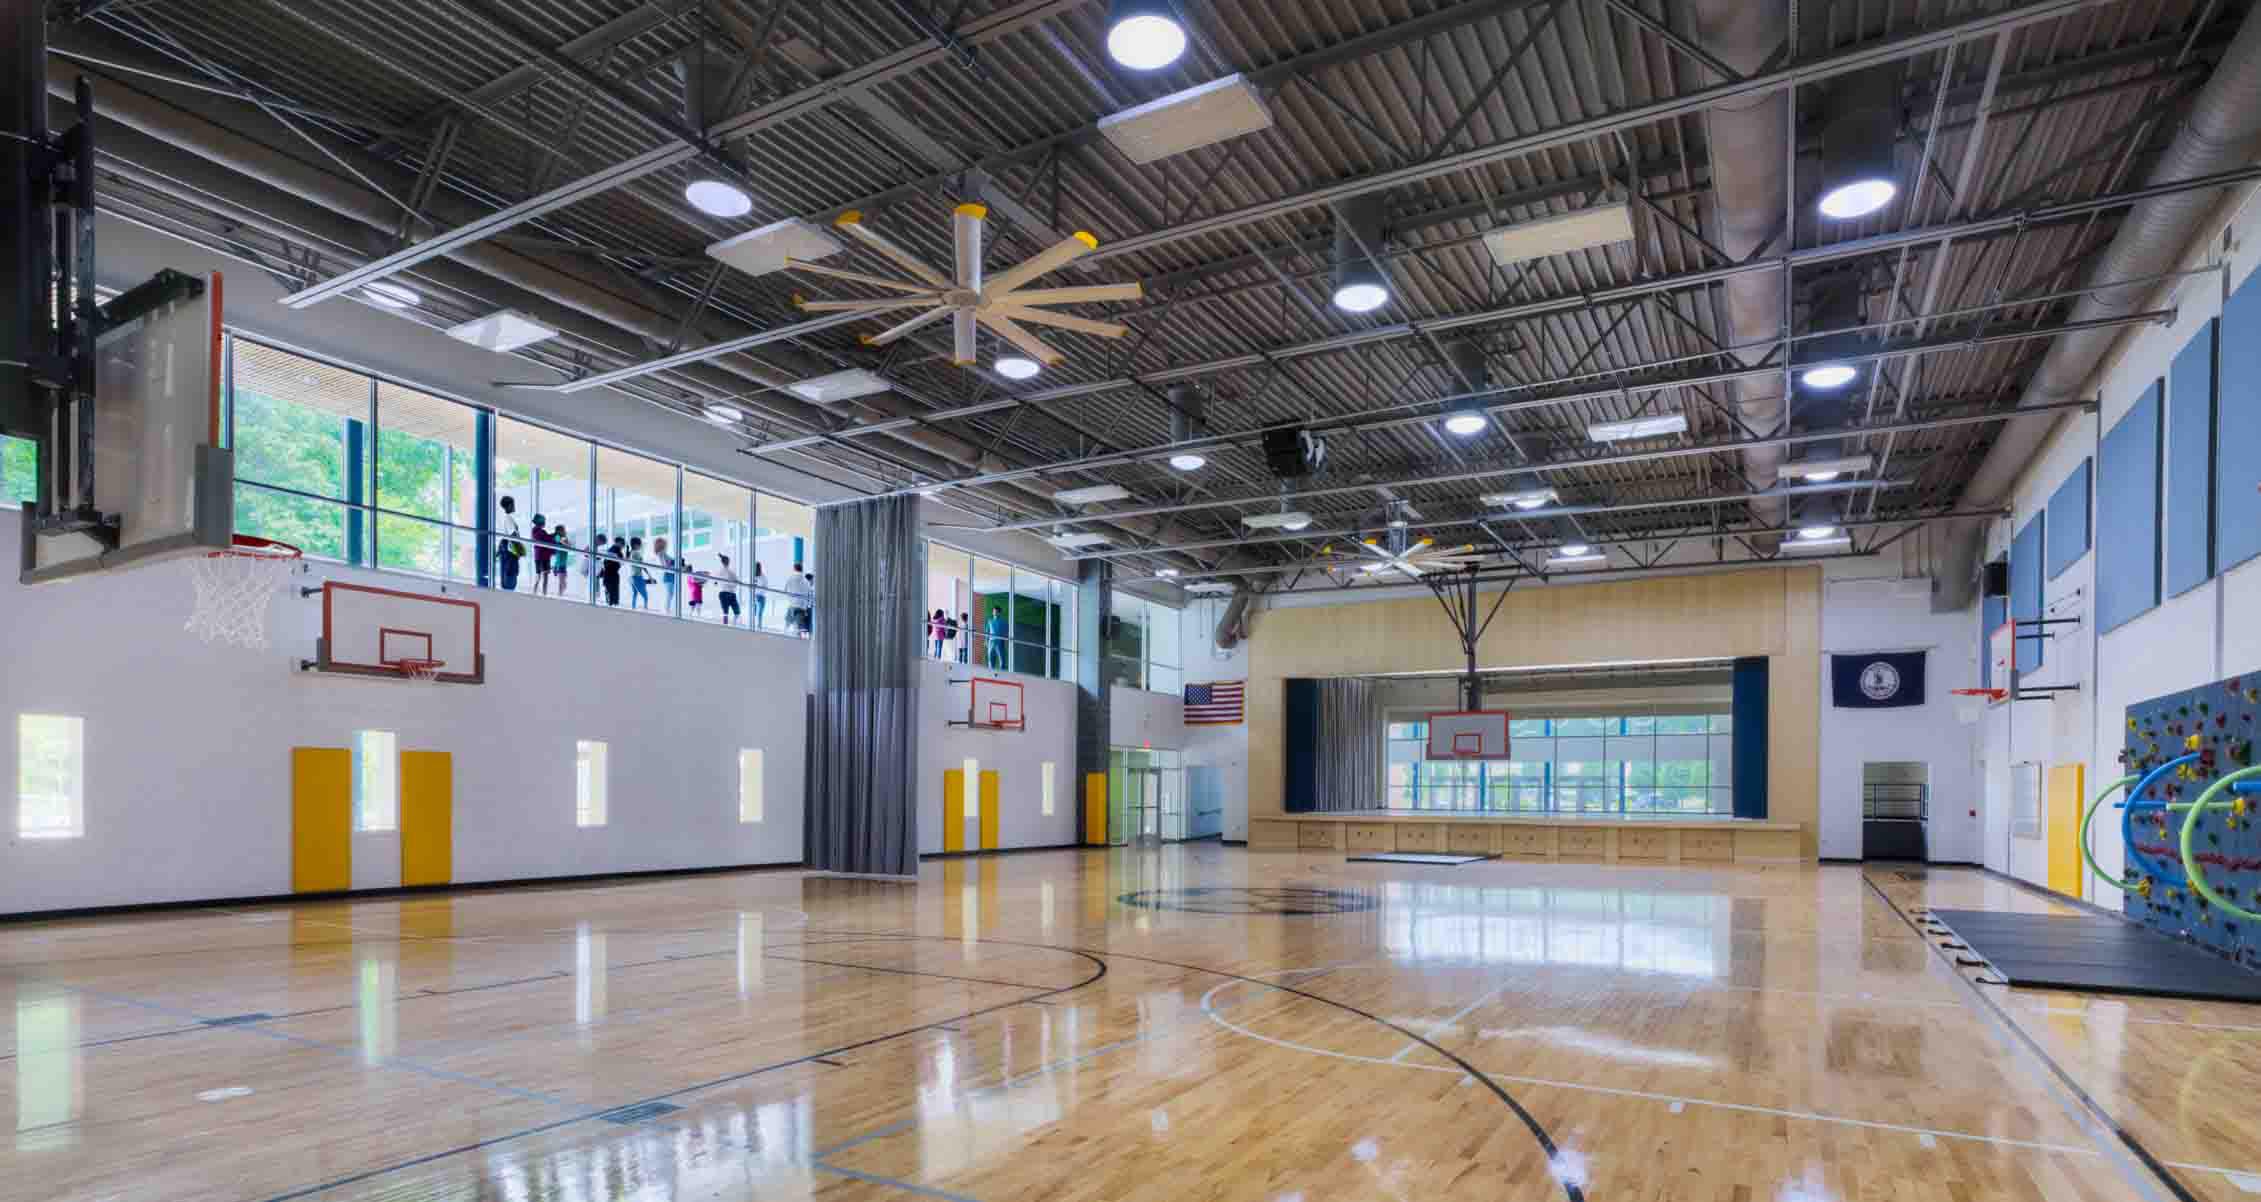 1-Manasass-Park-Elementary-School-(Need-Permission)